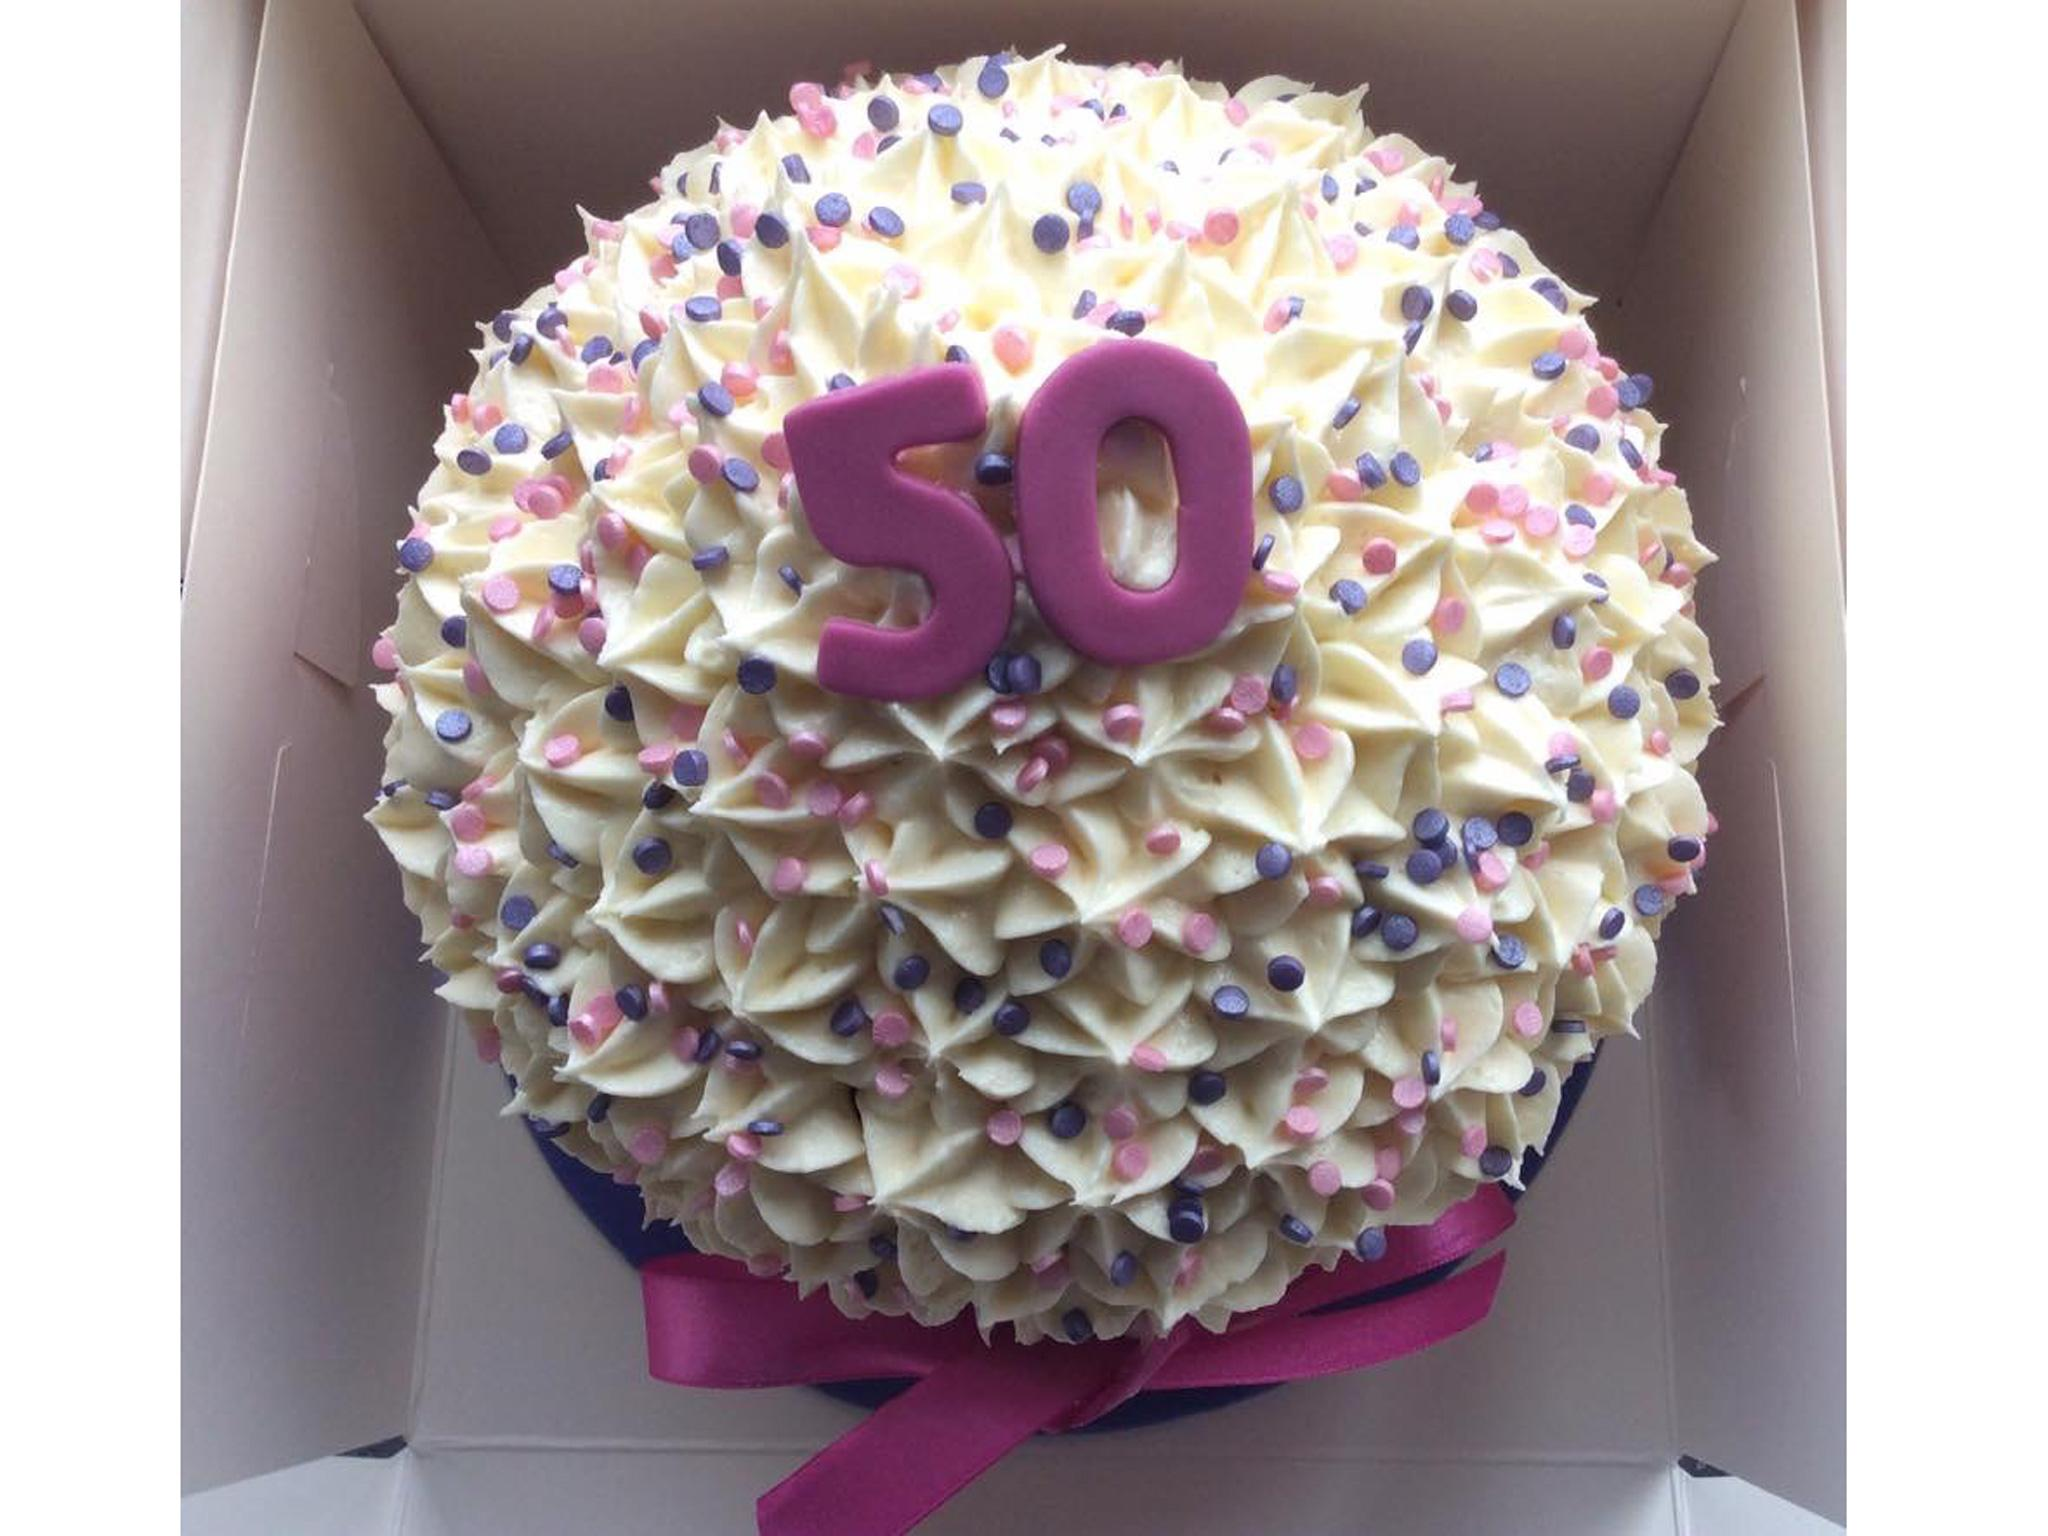 10 Best Gluten Free Birthday Cakes The Independent